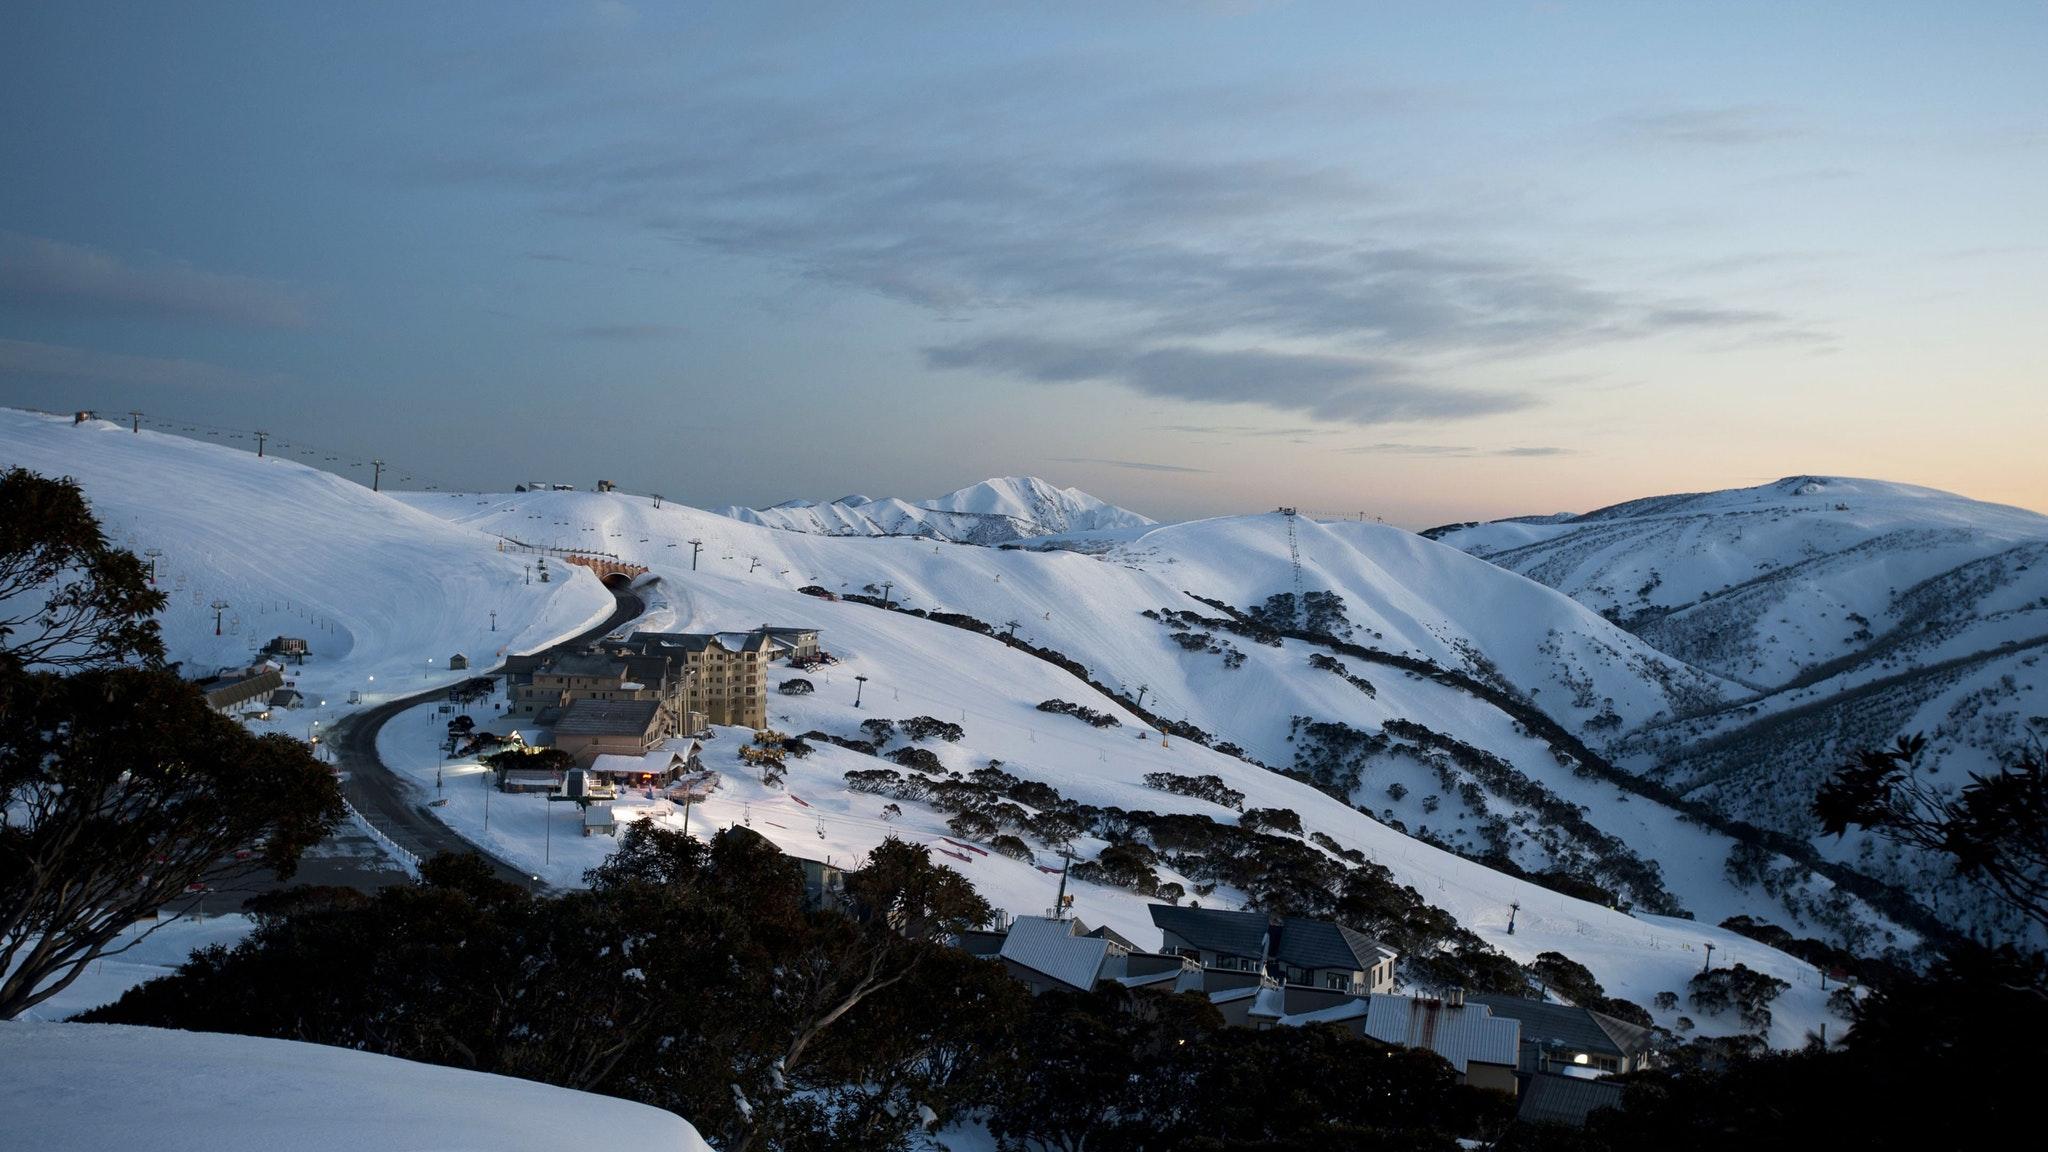 Hotham Alpine Resort